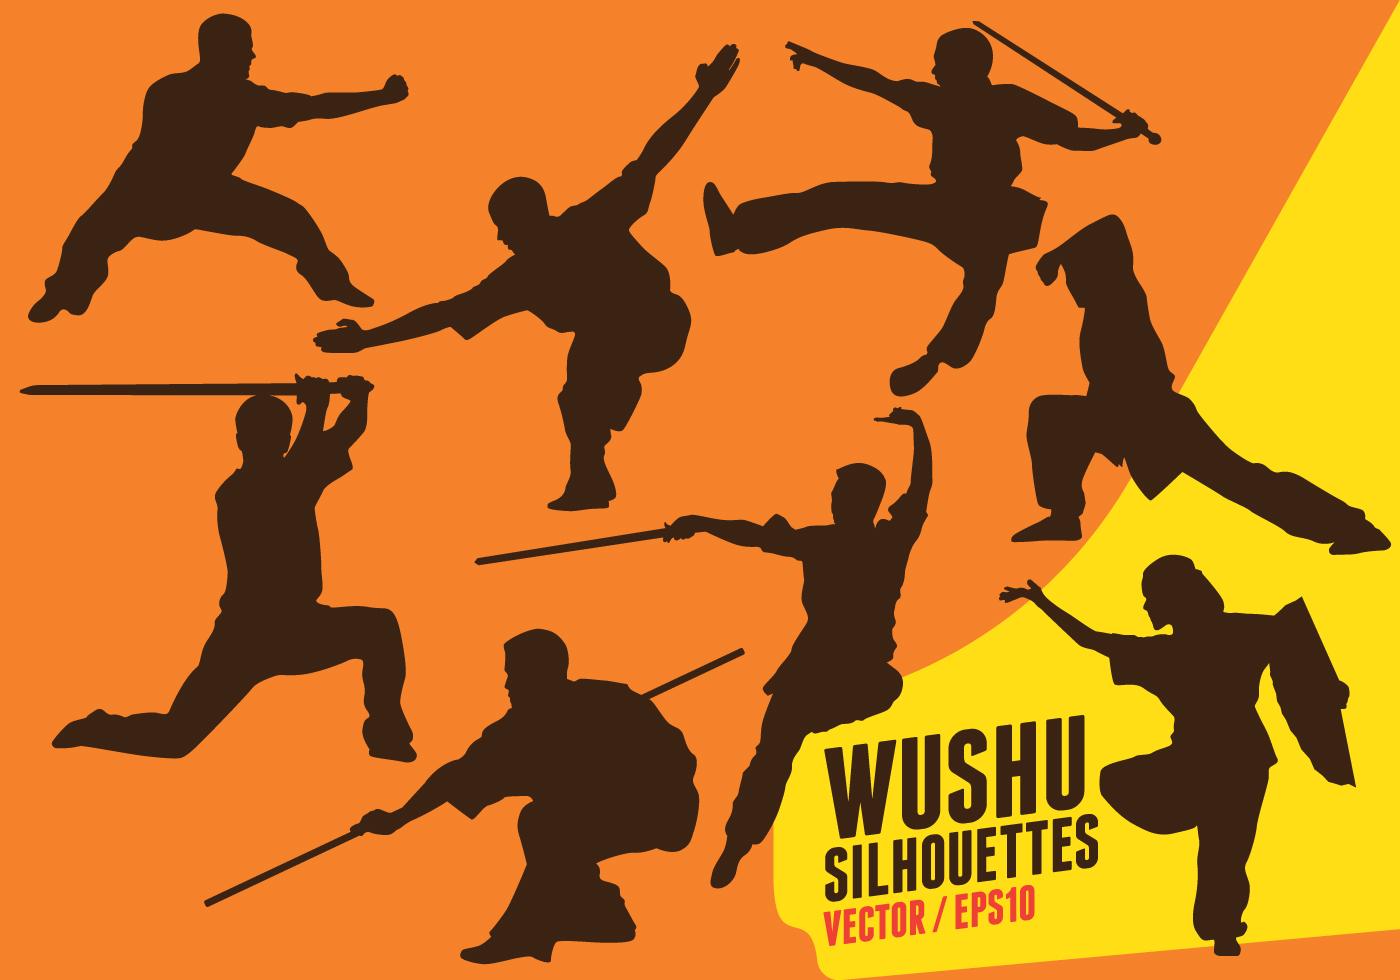 Silhuetas De Wushu Download Vetores Gratis Desenhos De Vetor